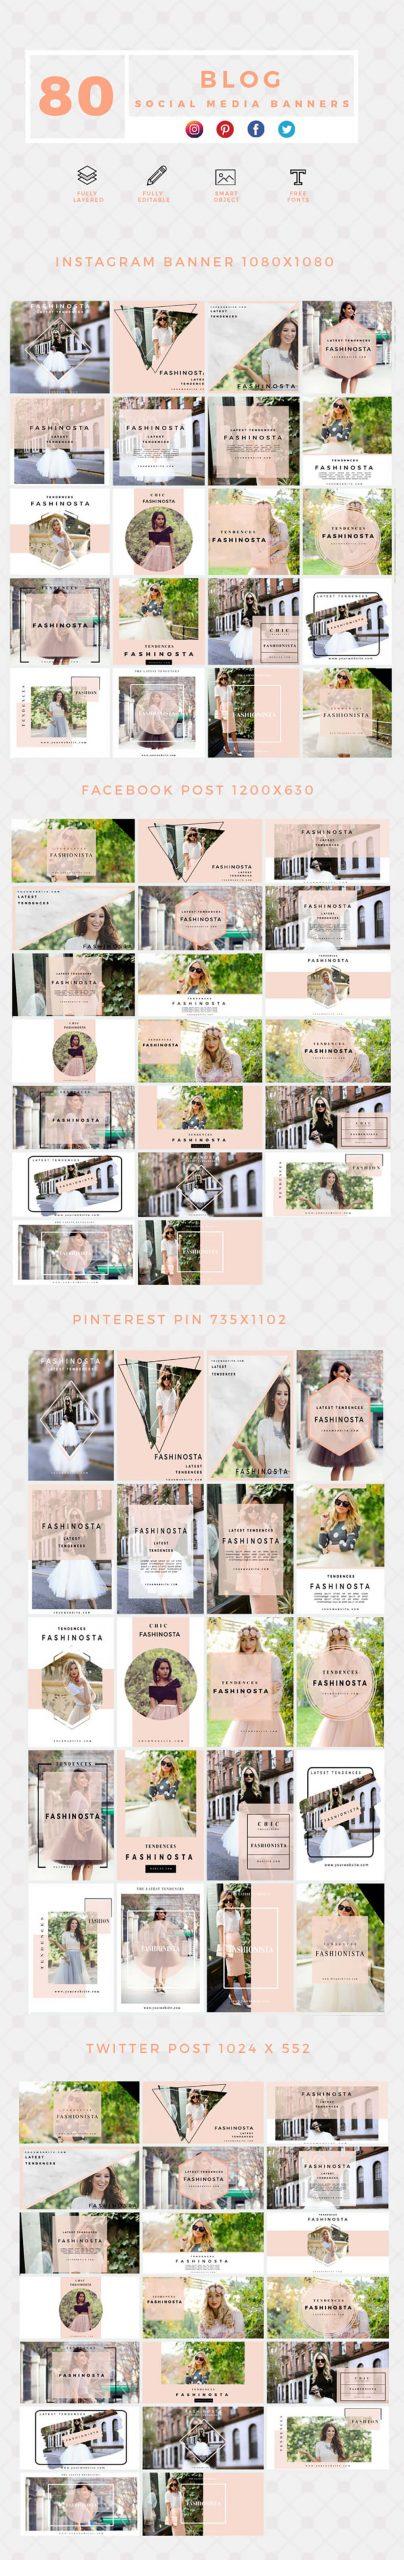 640 Social Media Banner Templates Bundle PREVIEW-BLOG